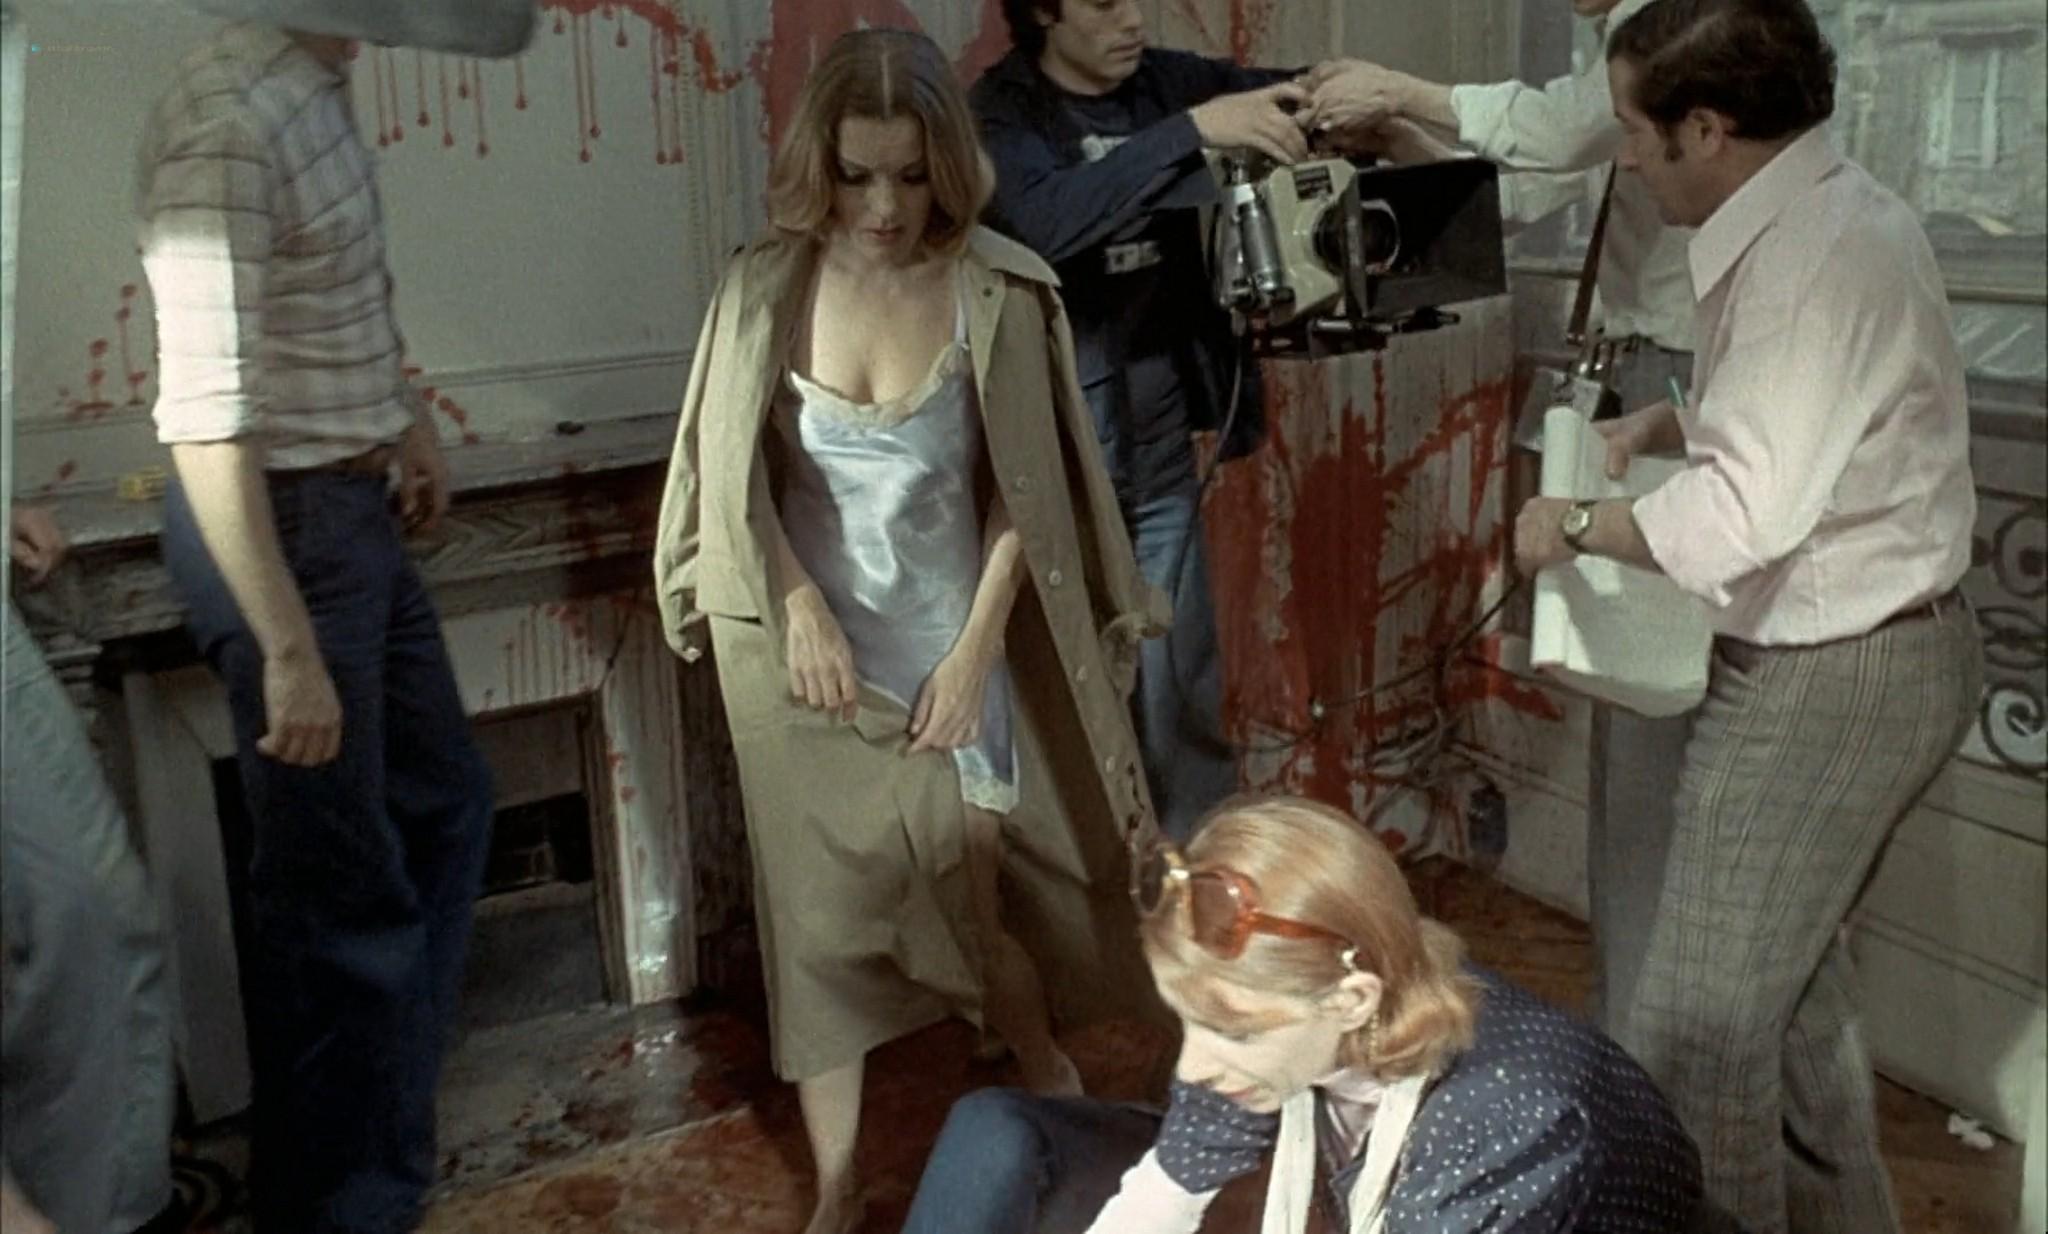 Romy Schneider nude butt Nadia Vasil bush others orgy - L'important c'est d'aimer (FR-1975) HD 1080p BluRay (19)